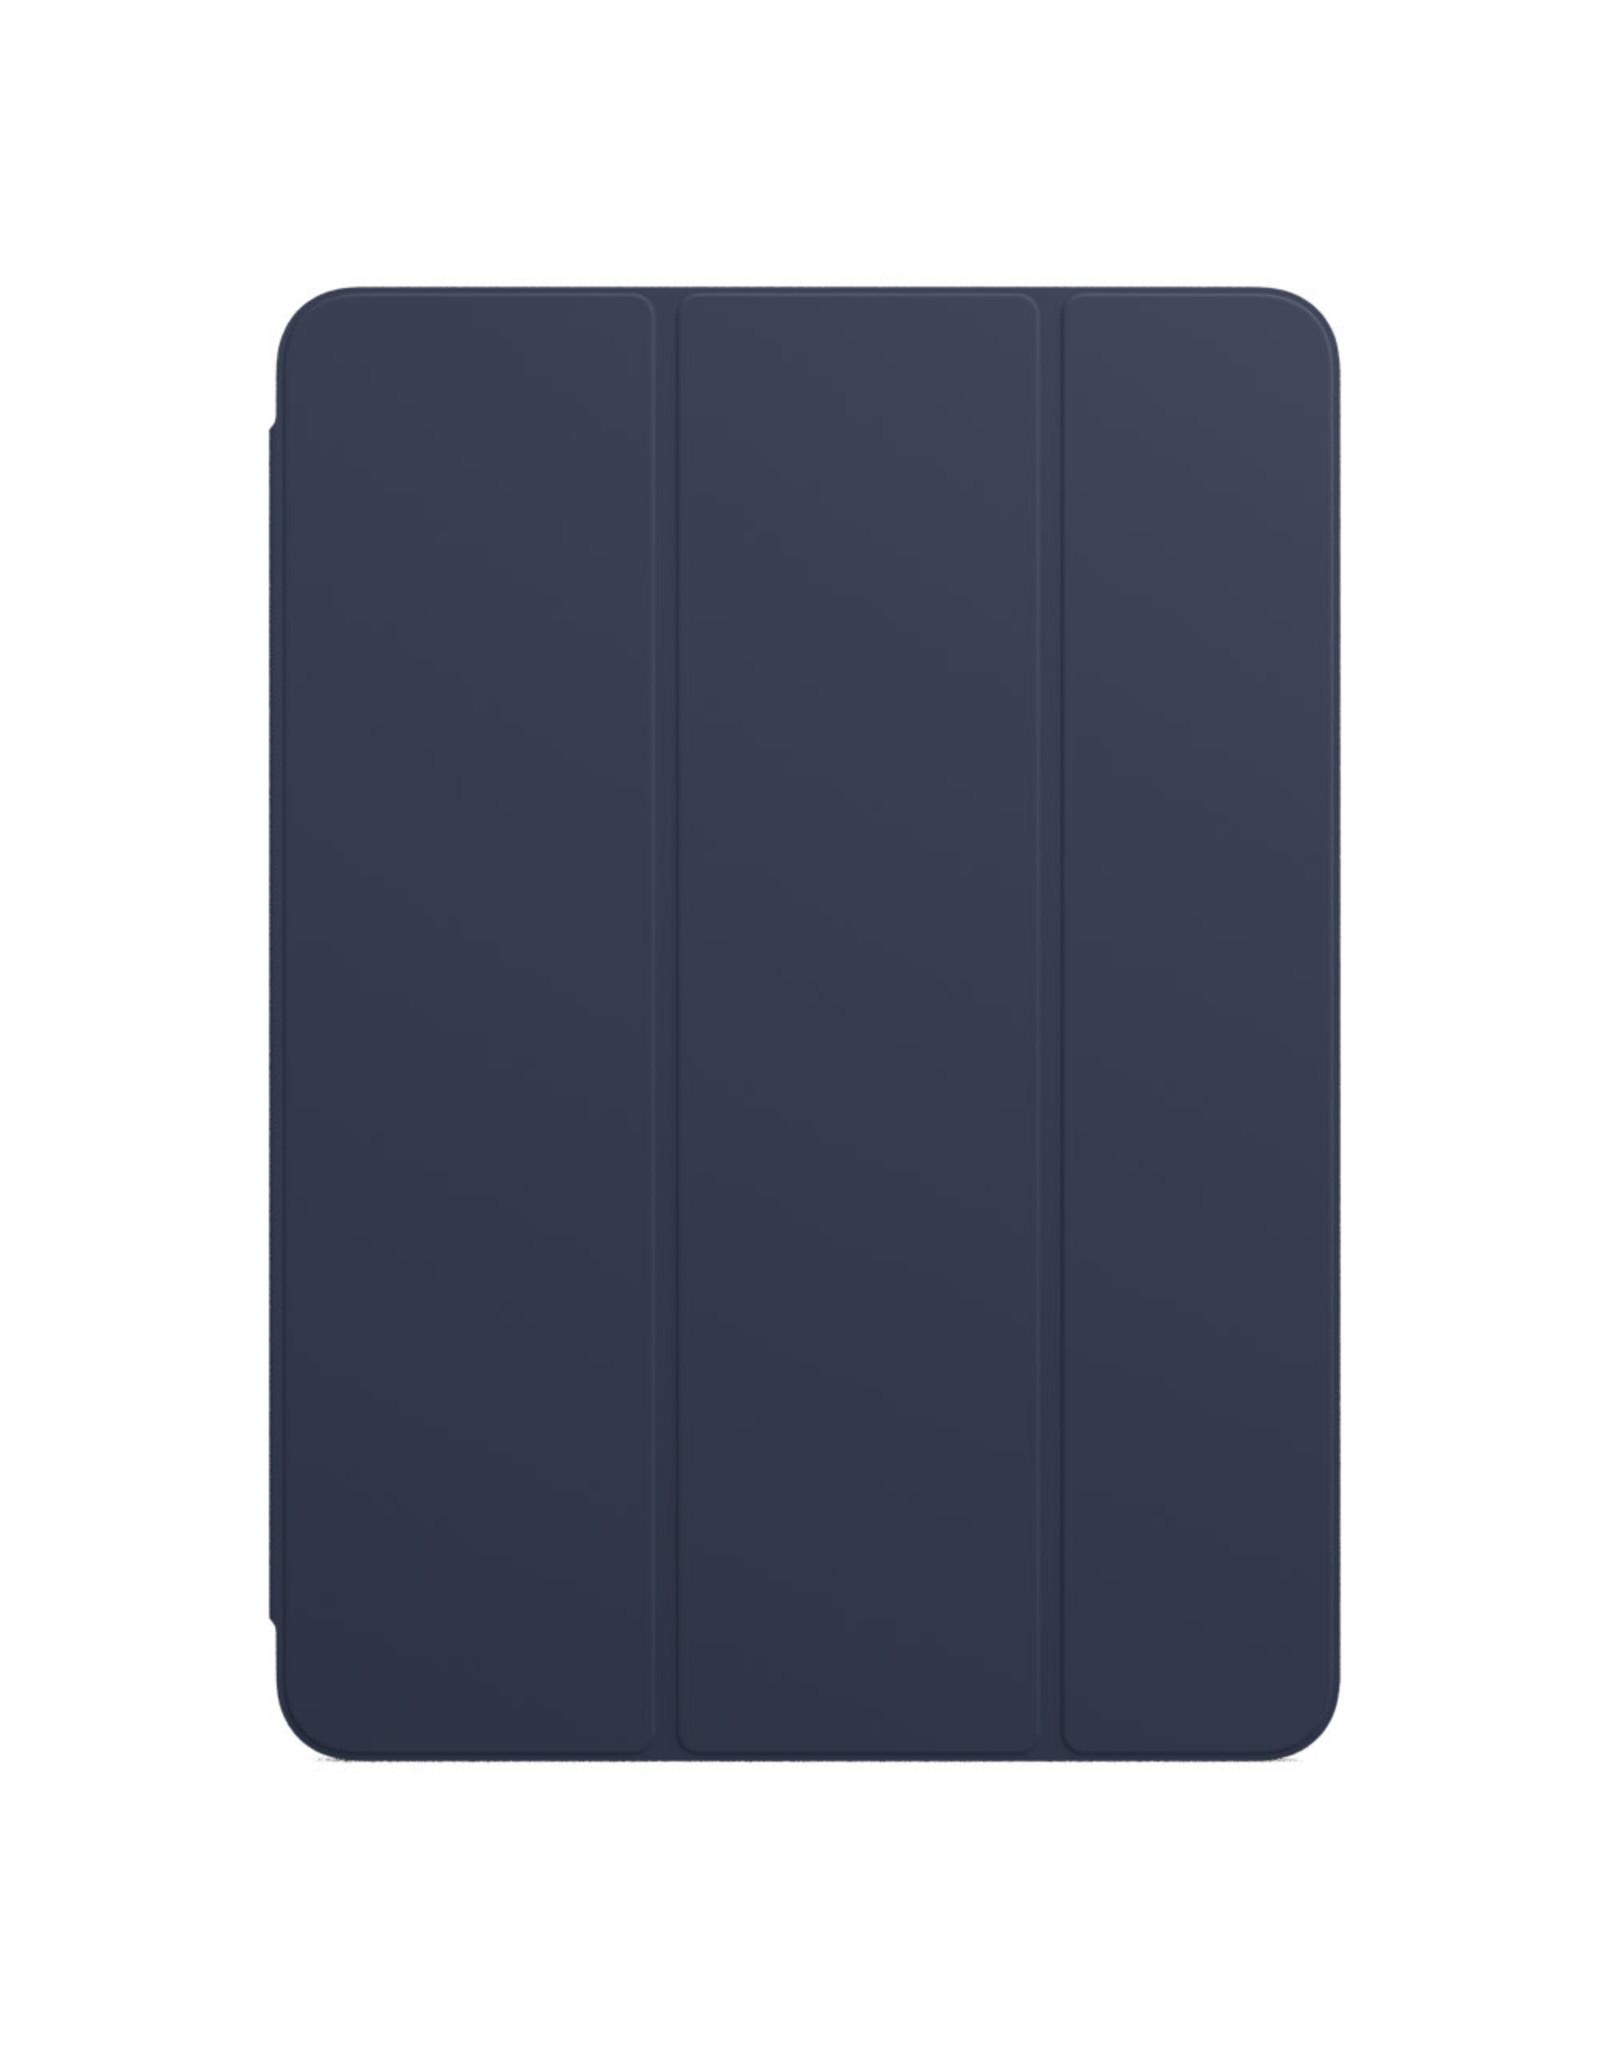 Apple Apple Smart Folio for iPad Pro 11-inch (3rd generation) - Deep Navy